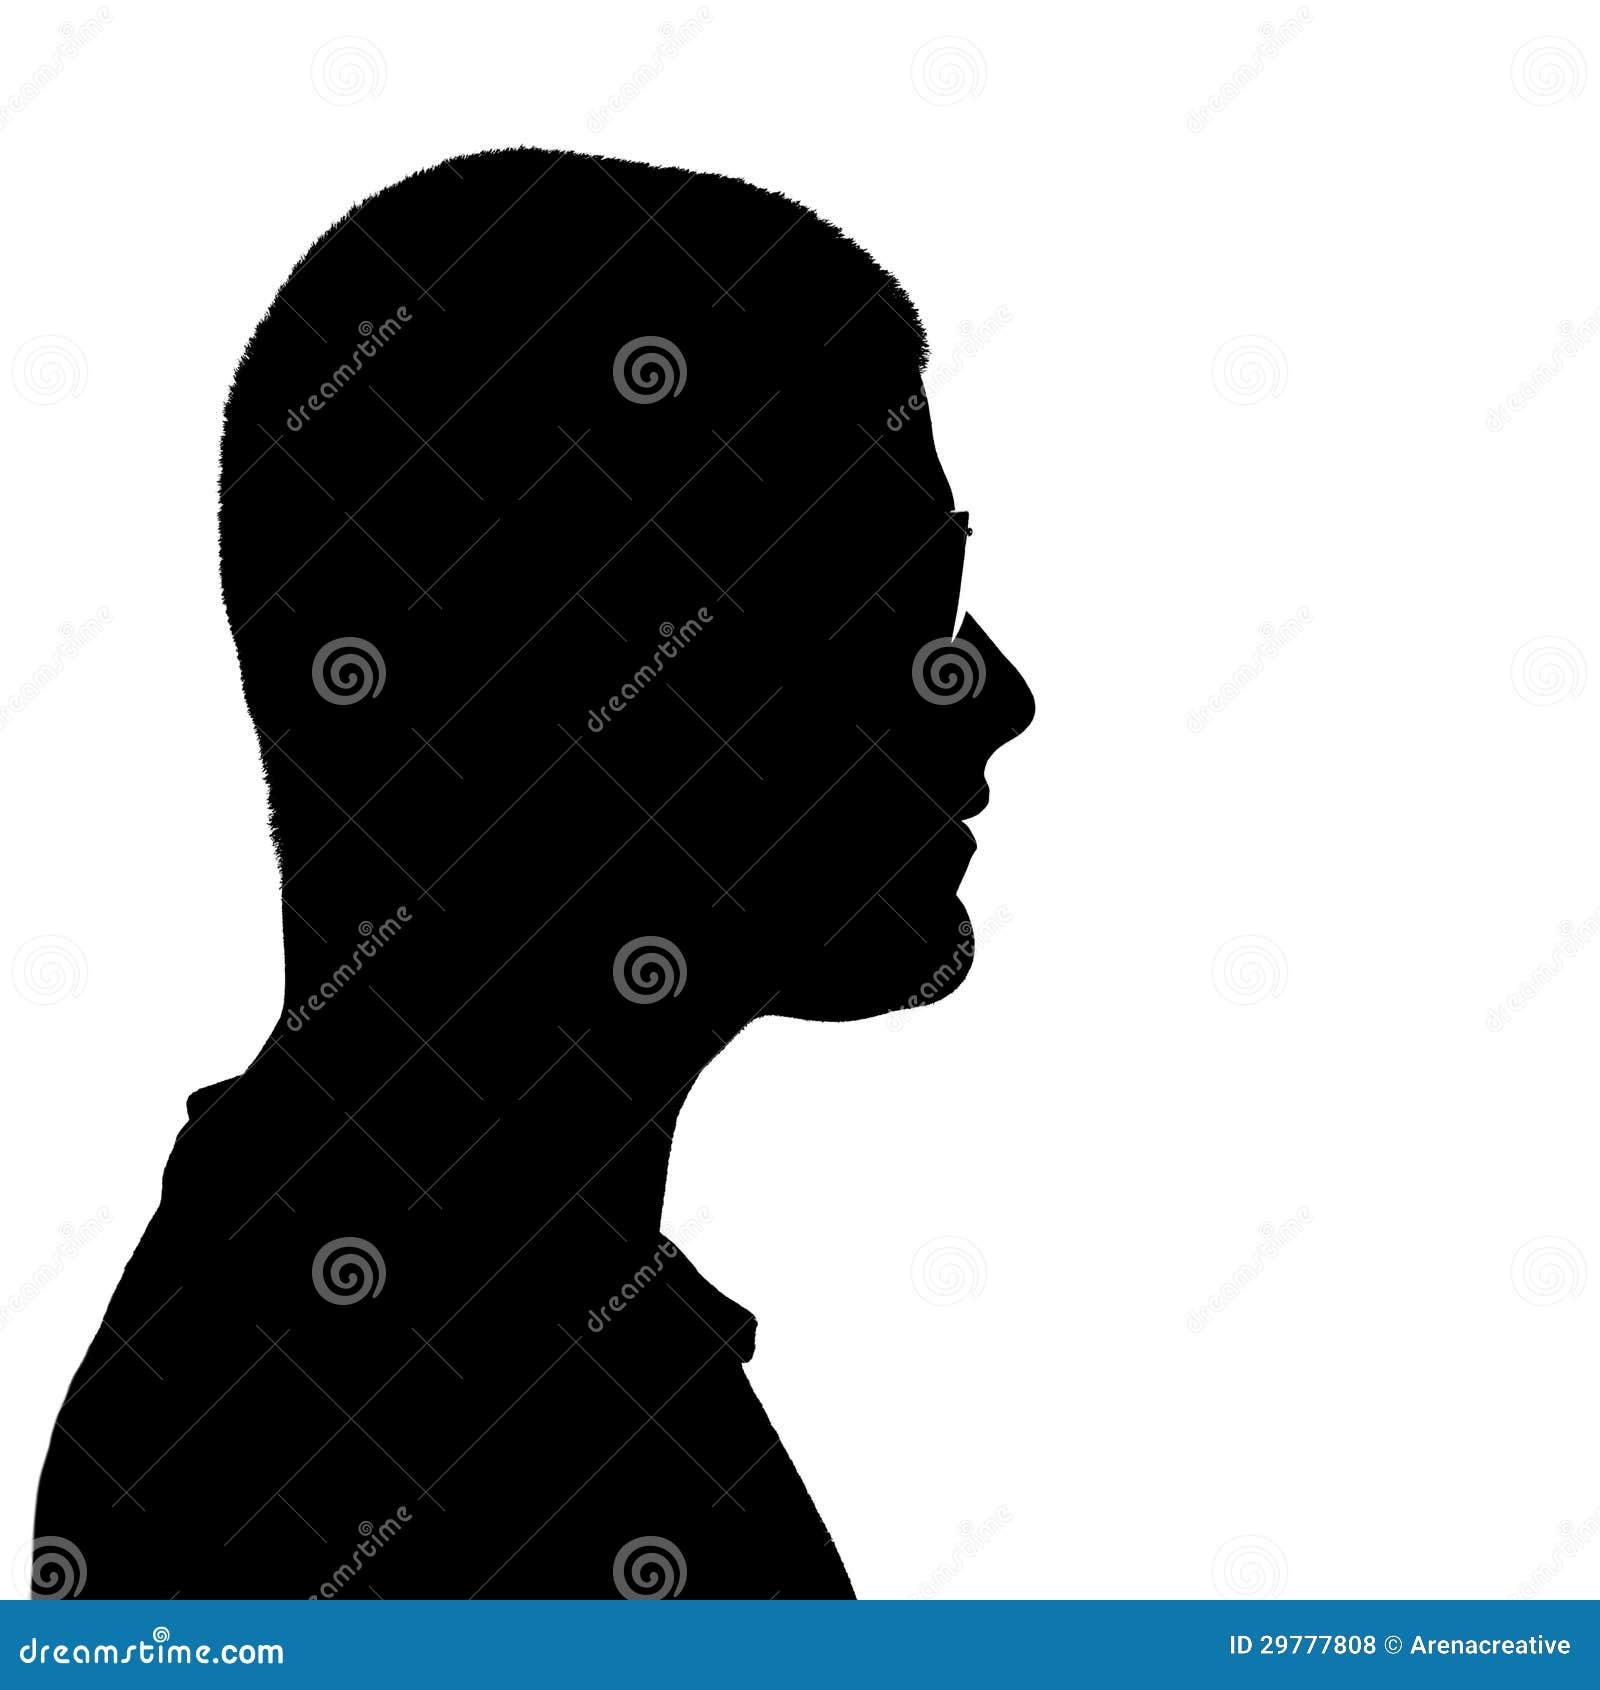 Search profile of man erotic